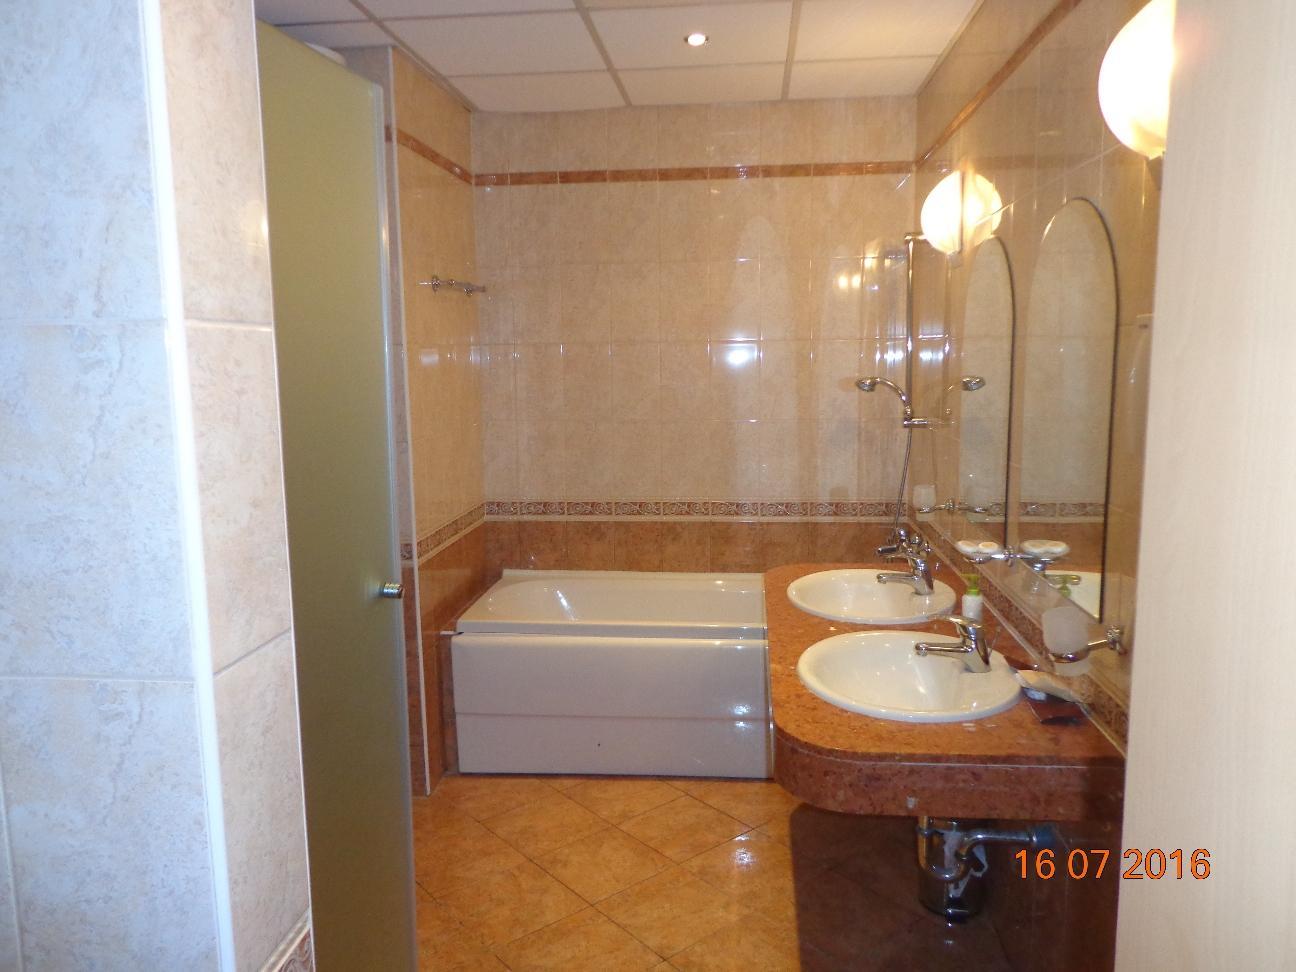 1562875885-sell-property-bathroom.jpg